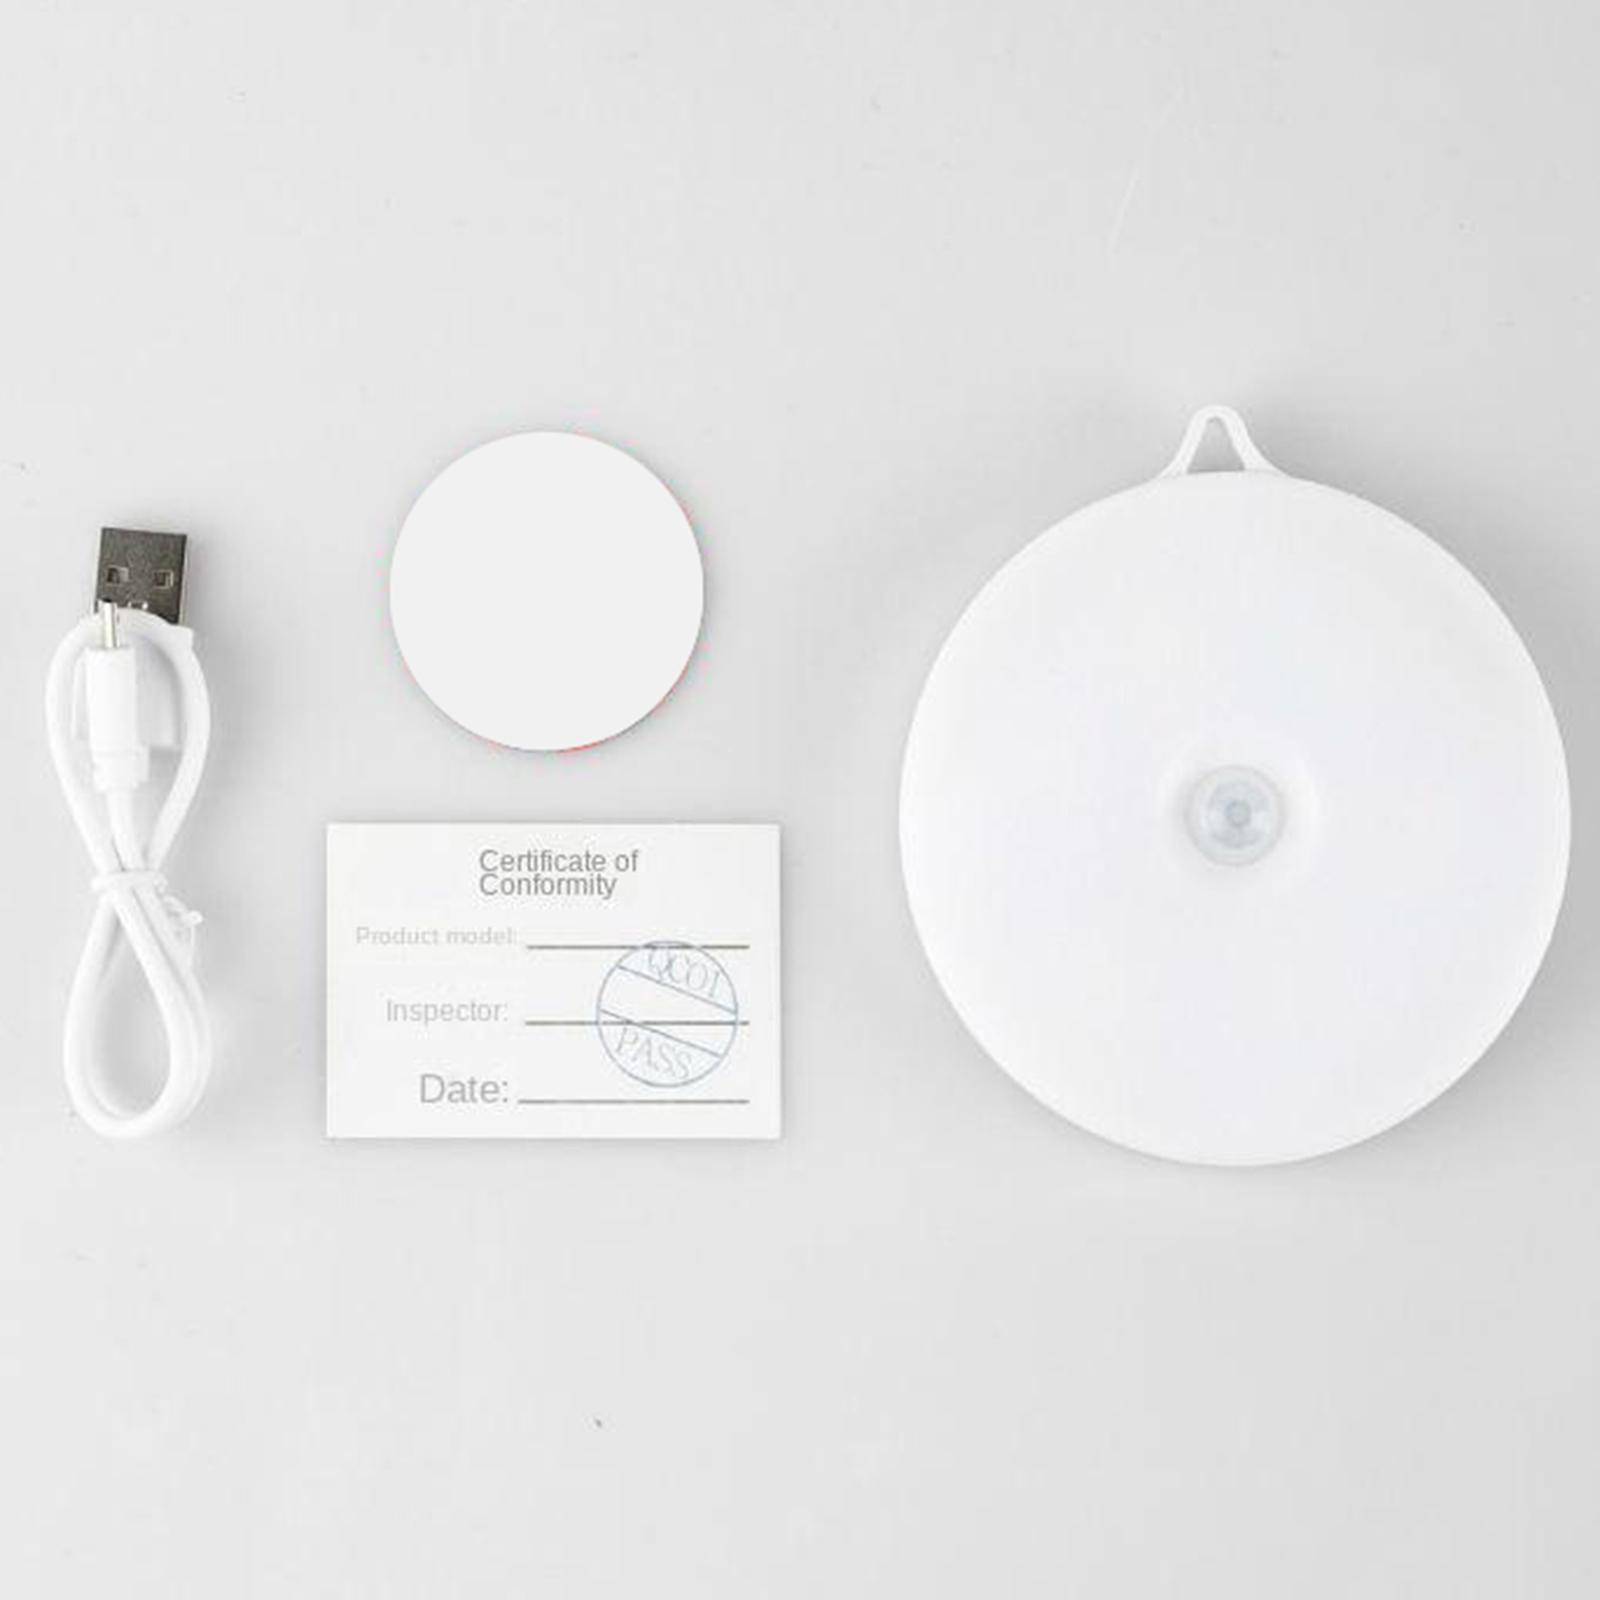 miniatura 21 - Luce notturna a LED per camera da letto ricaricabile USB per Hotel con sensore